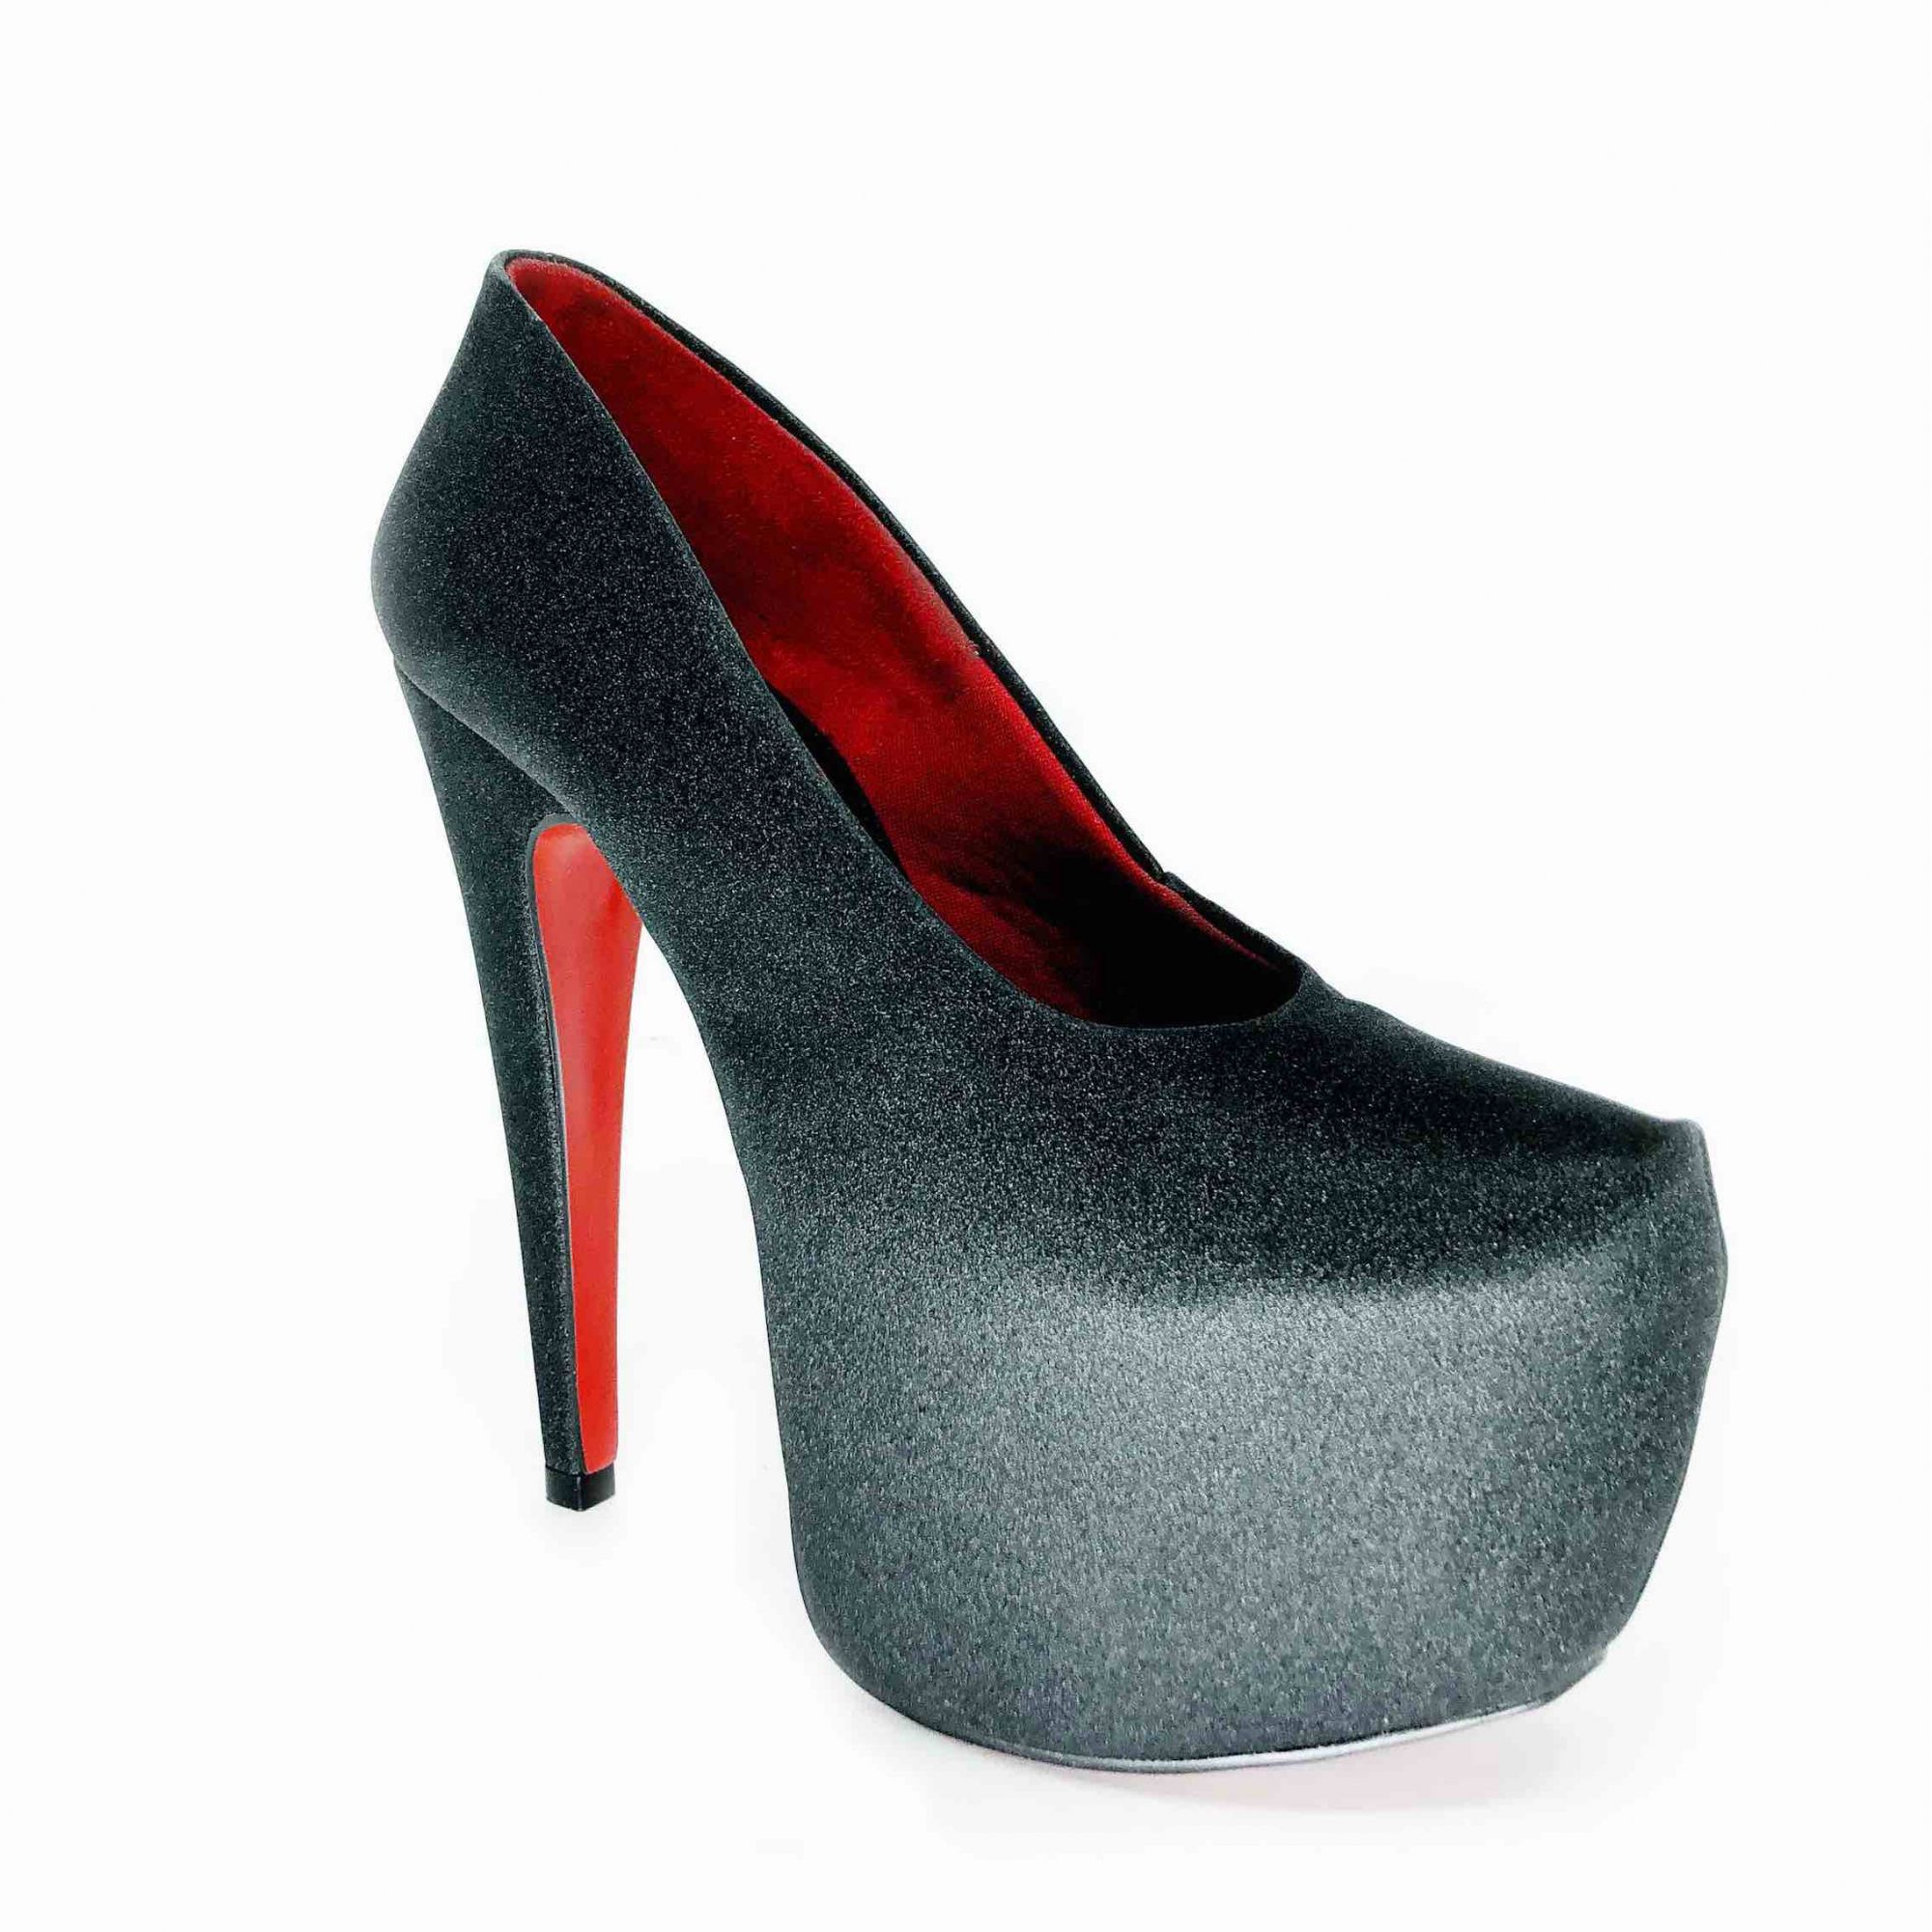 Scarpin Beyonce Preto NR 9 US - Play Heels